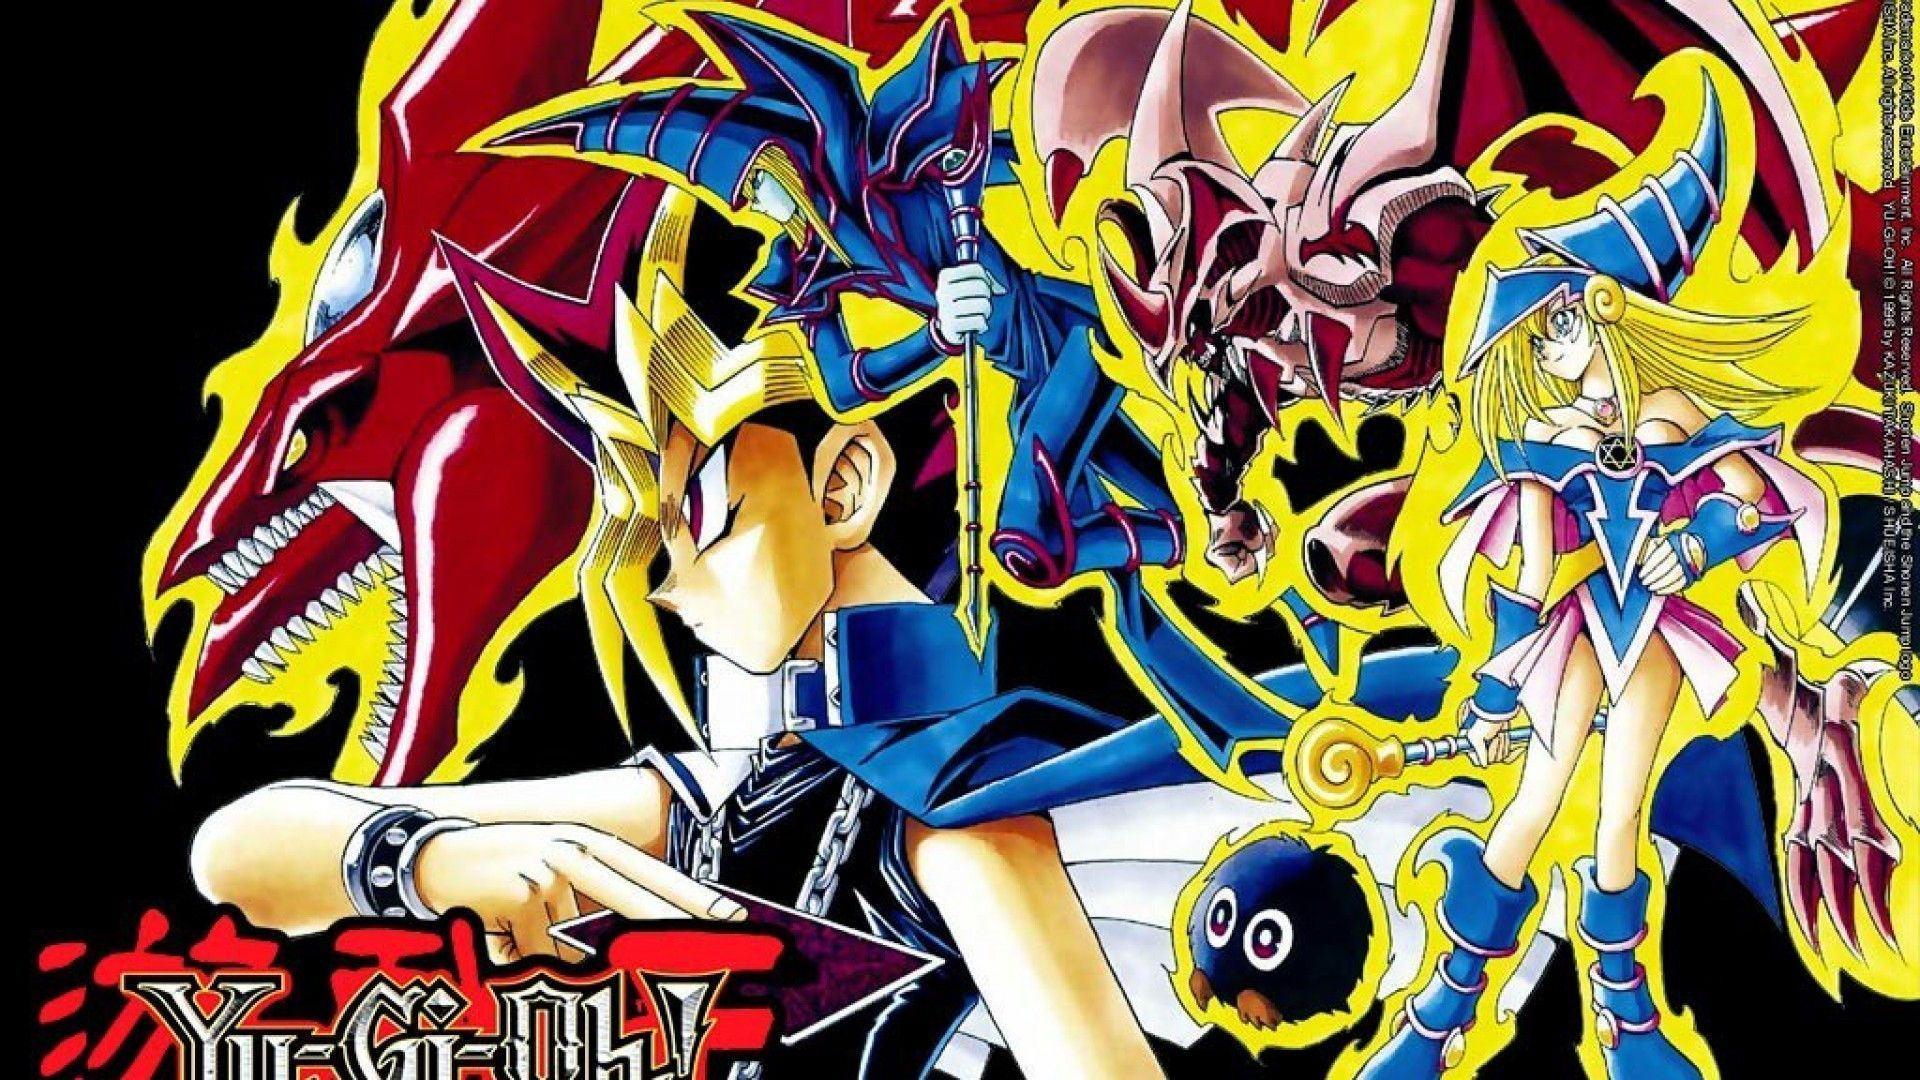 Yugioh Wallpaper Hd Free Download Anime Wallpaper Anime